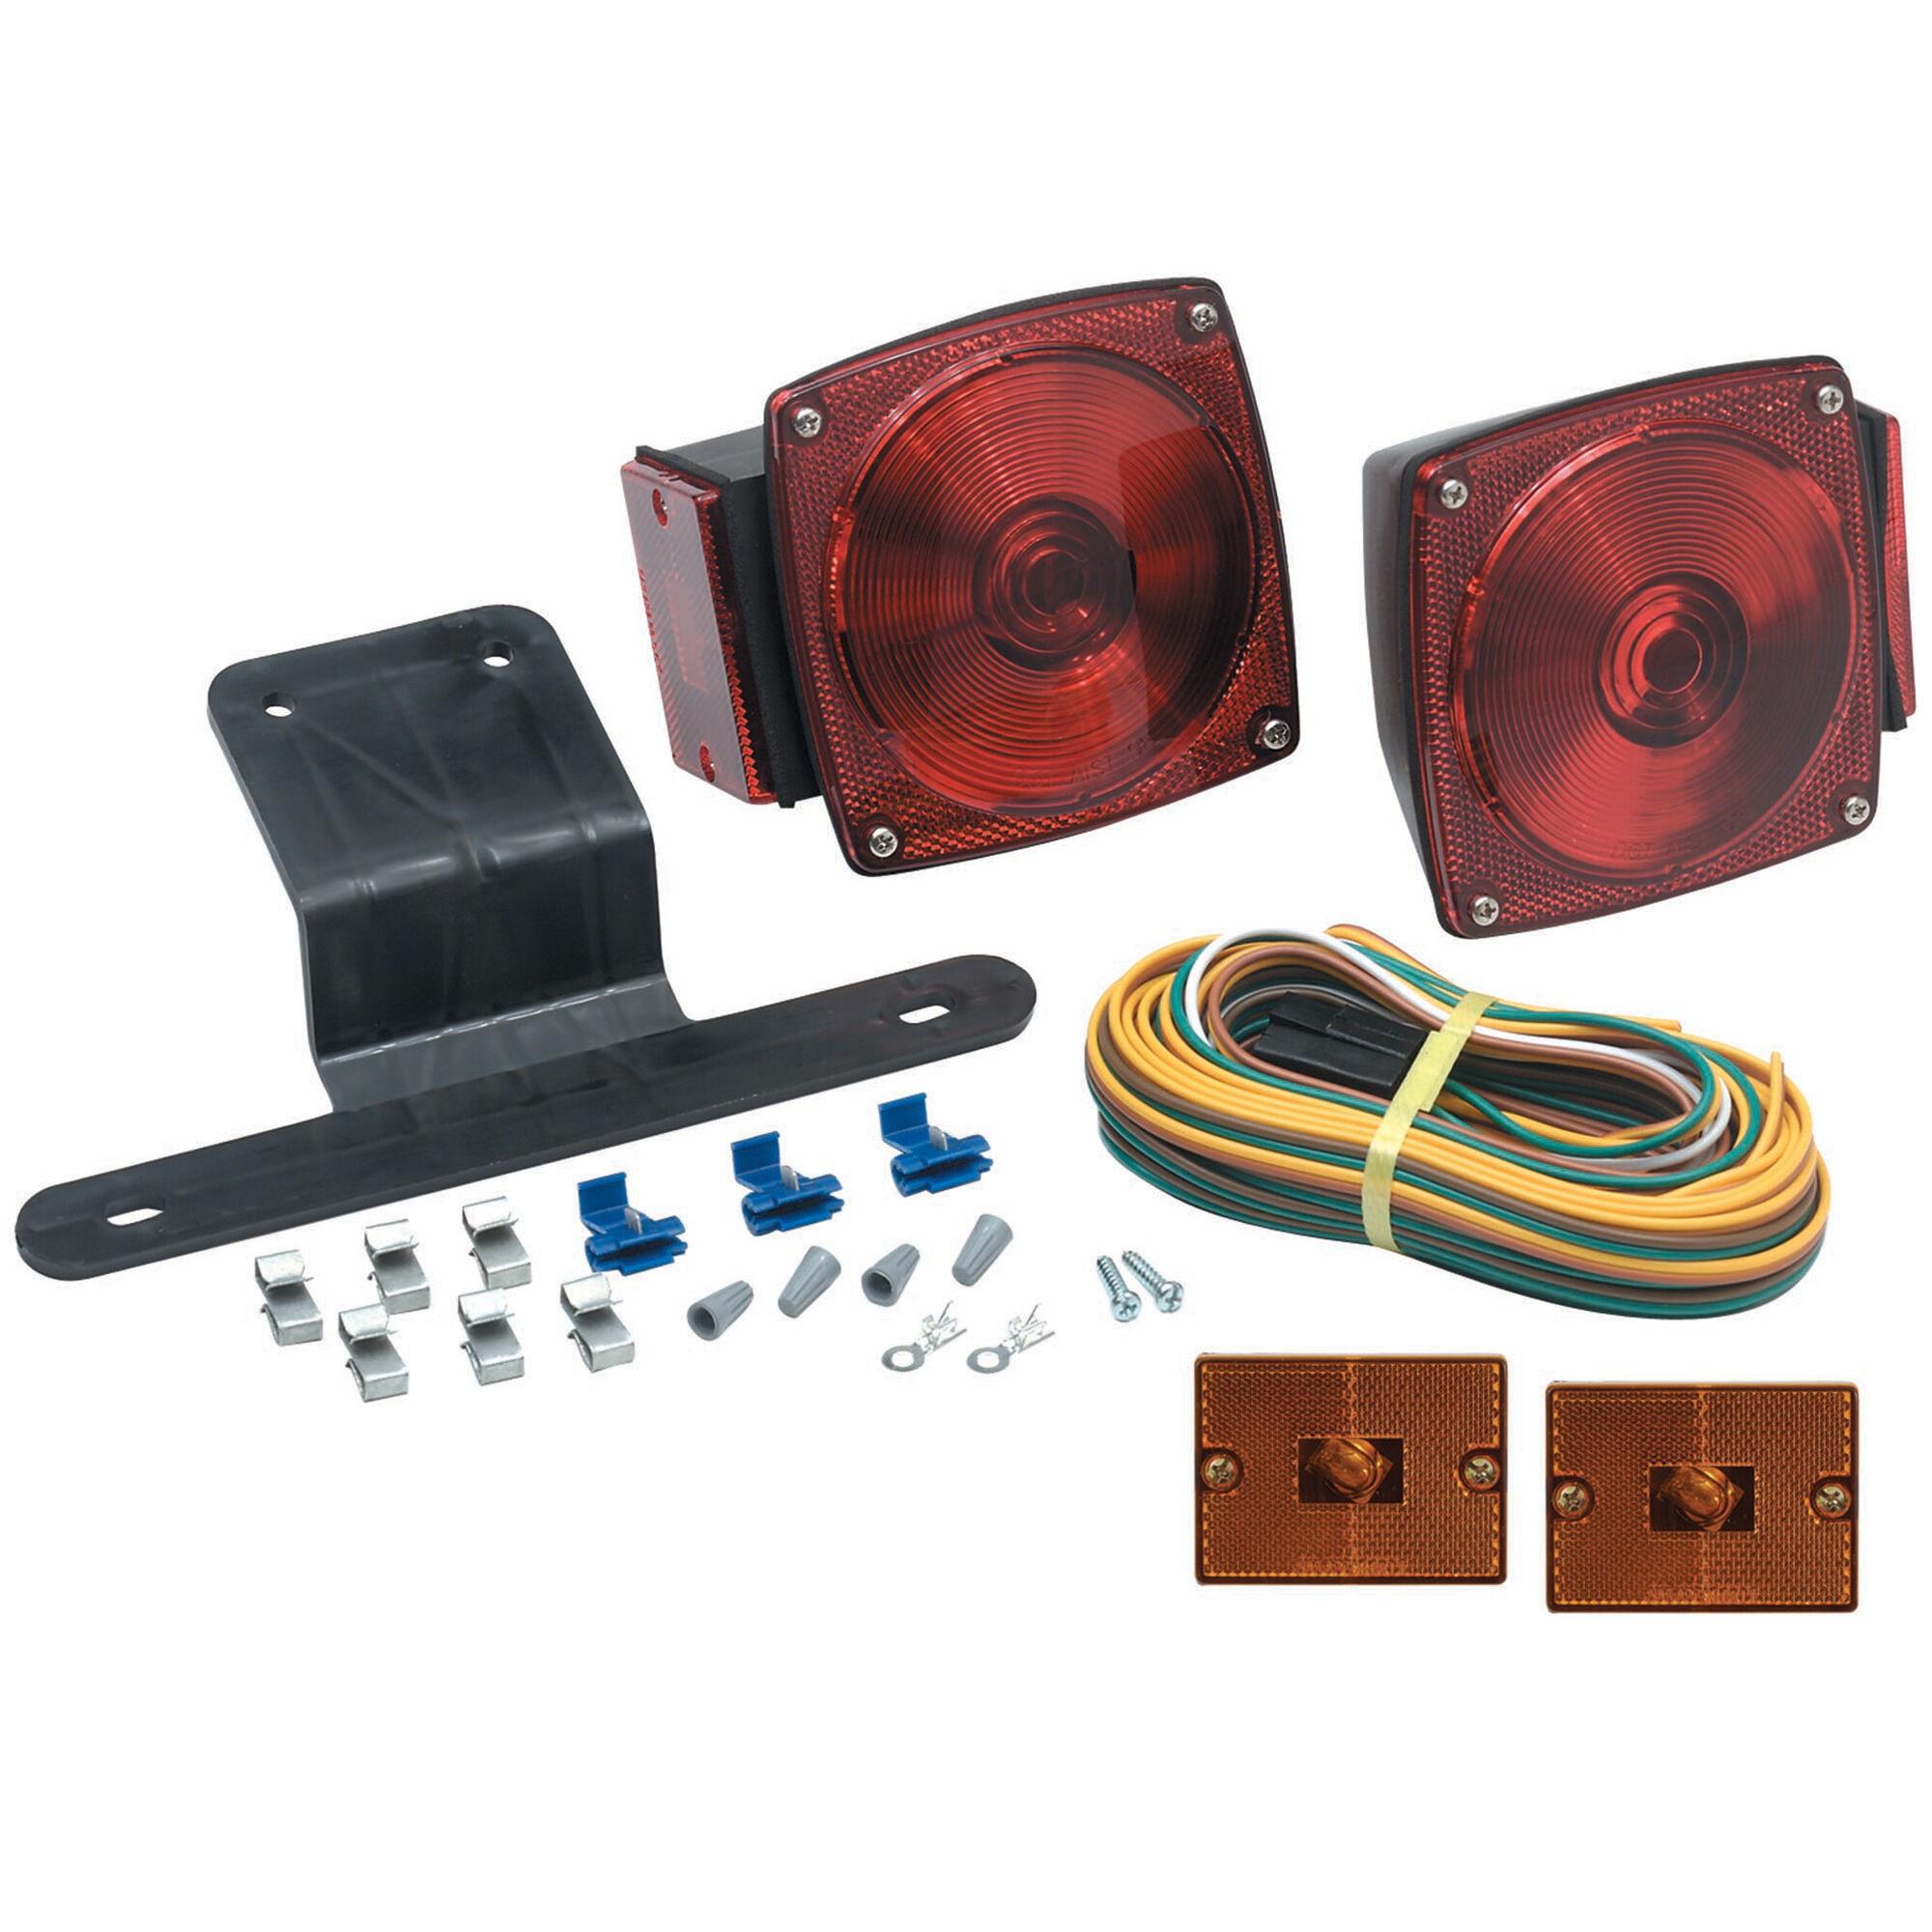 optronics submersible universal mount combination trailer light kit Trailer Harness Diagram